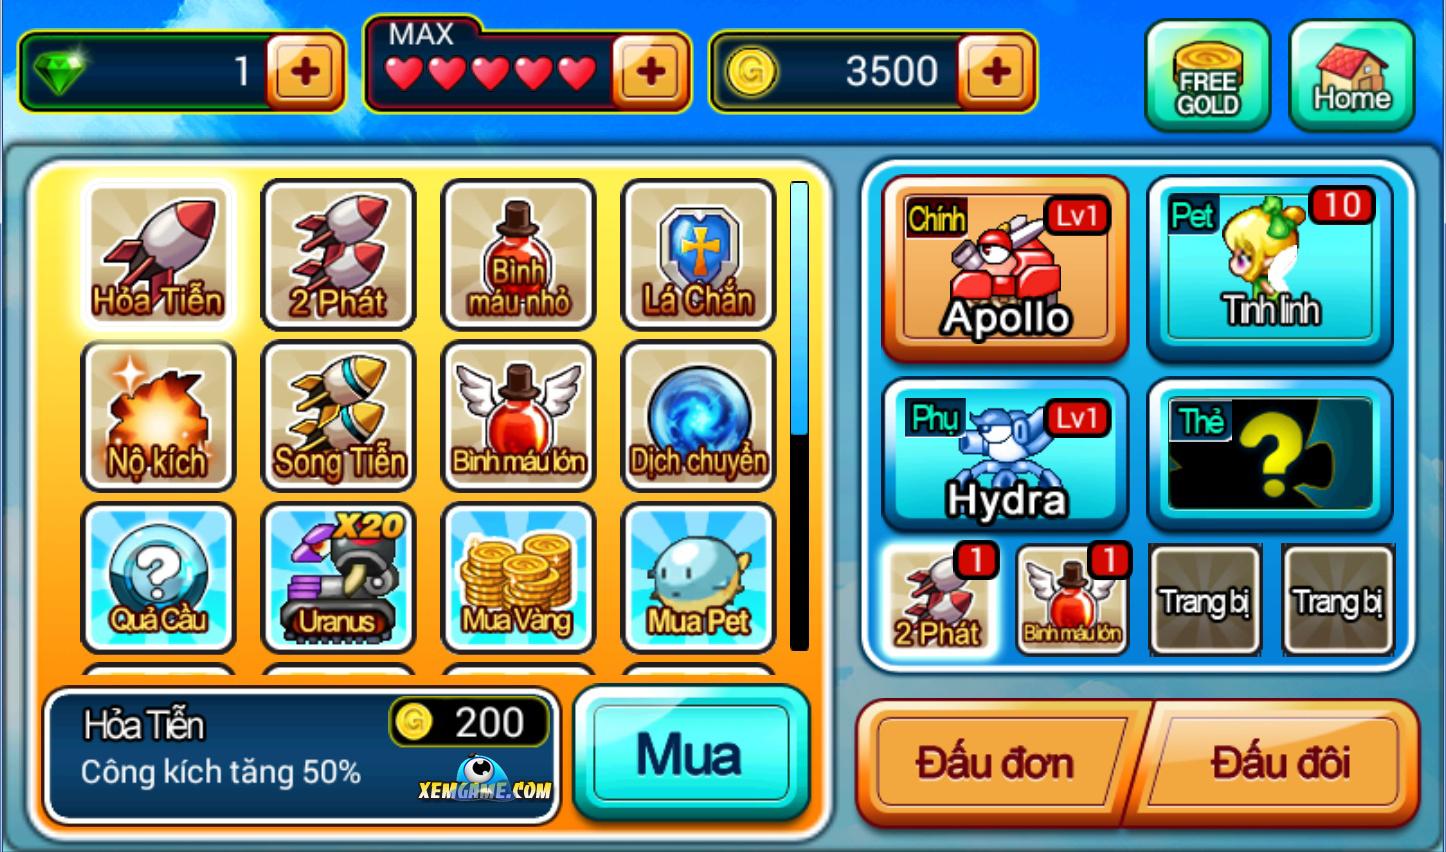 game-oppa_-tank-mobile-10.jpg (1446×852)